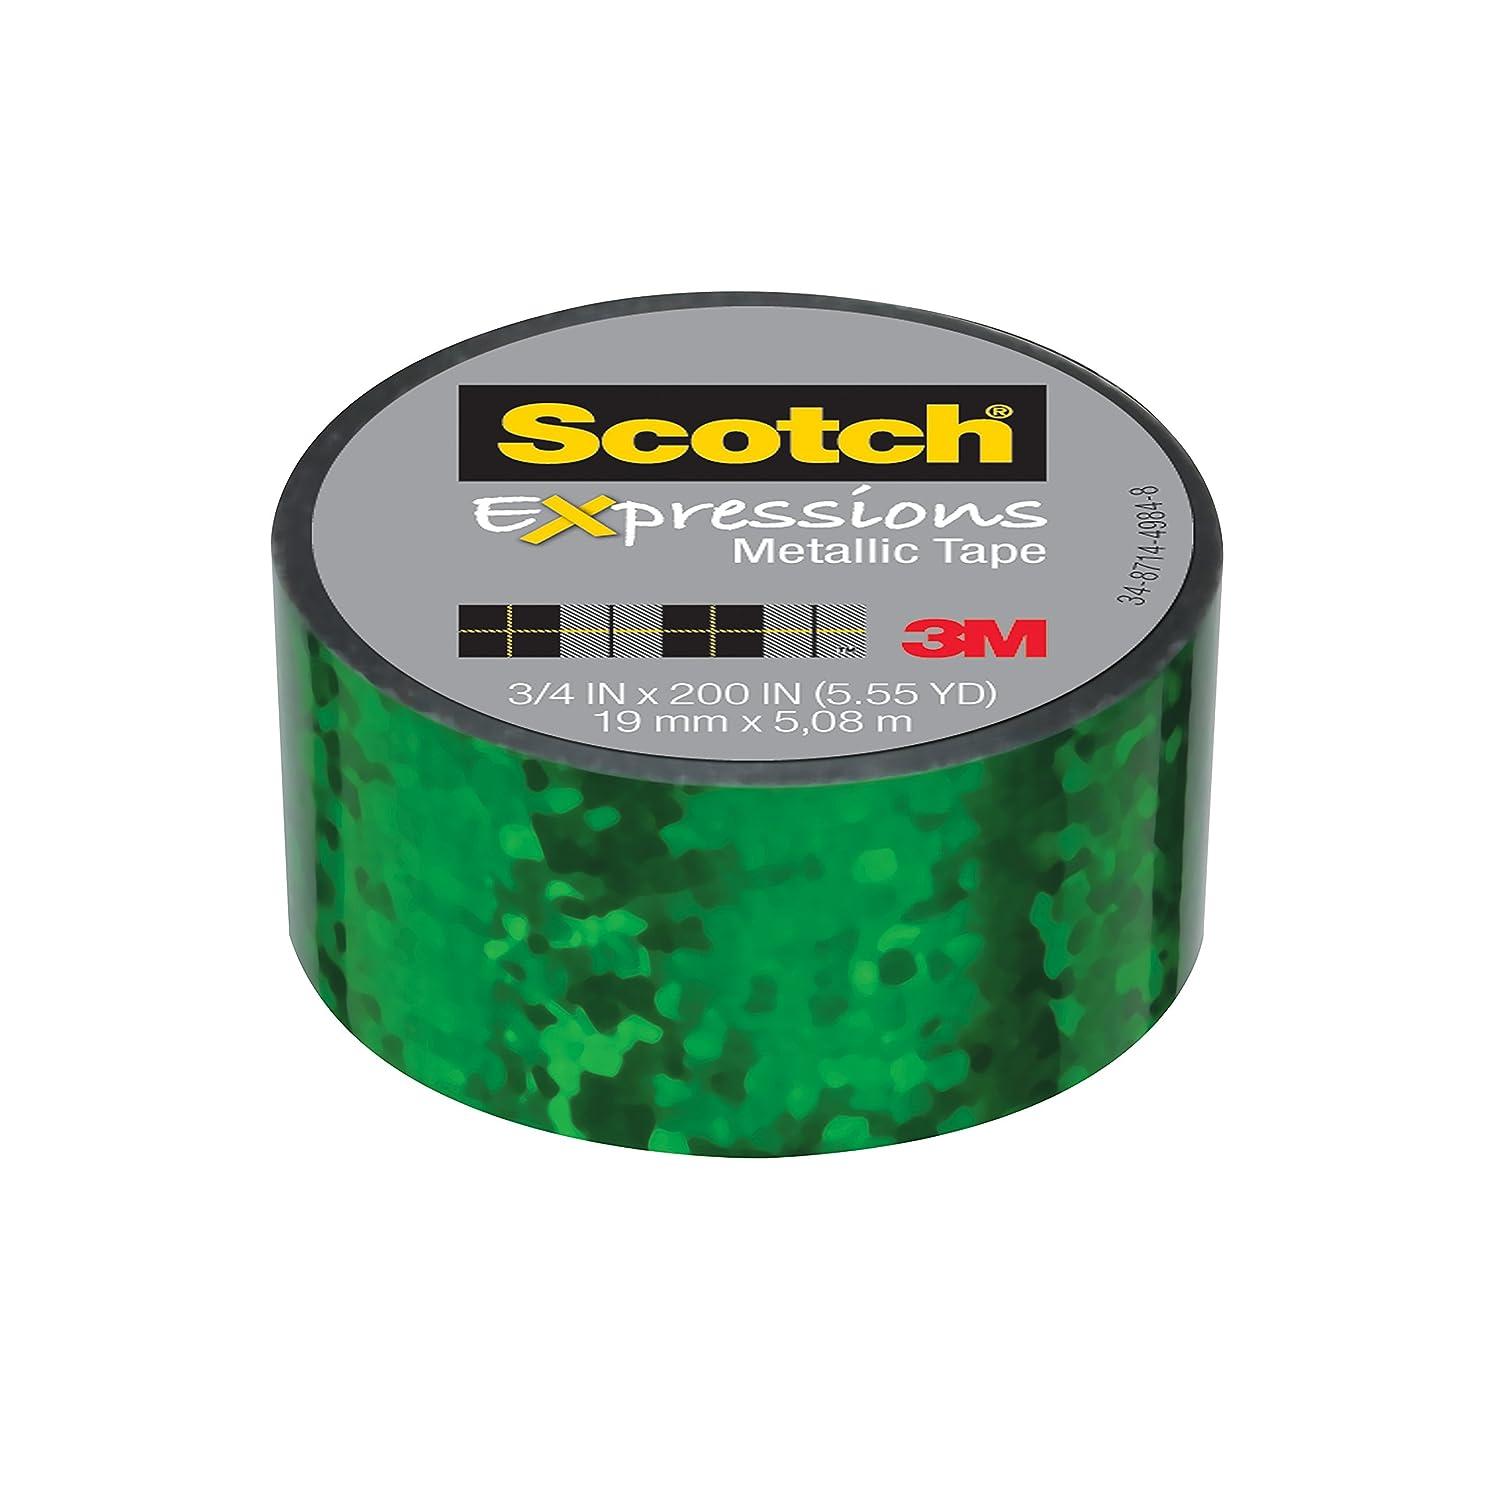 Scotch Expressions Metallic Tape, 3/4